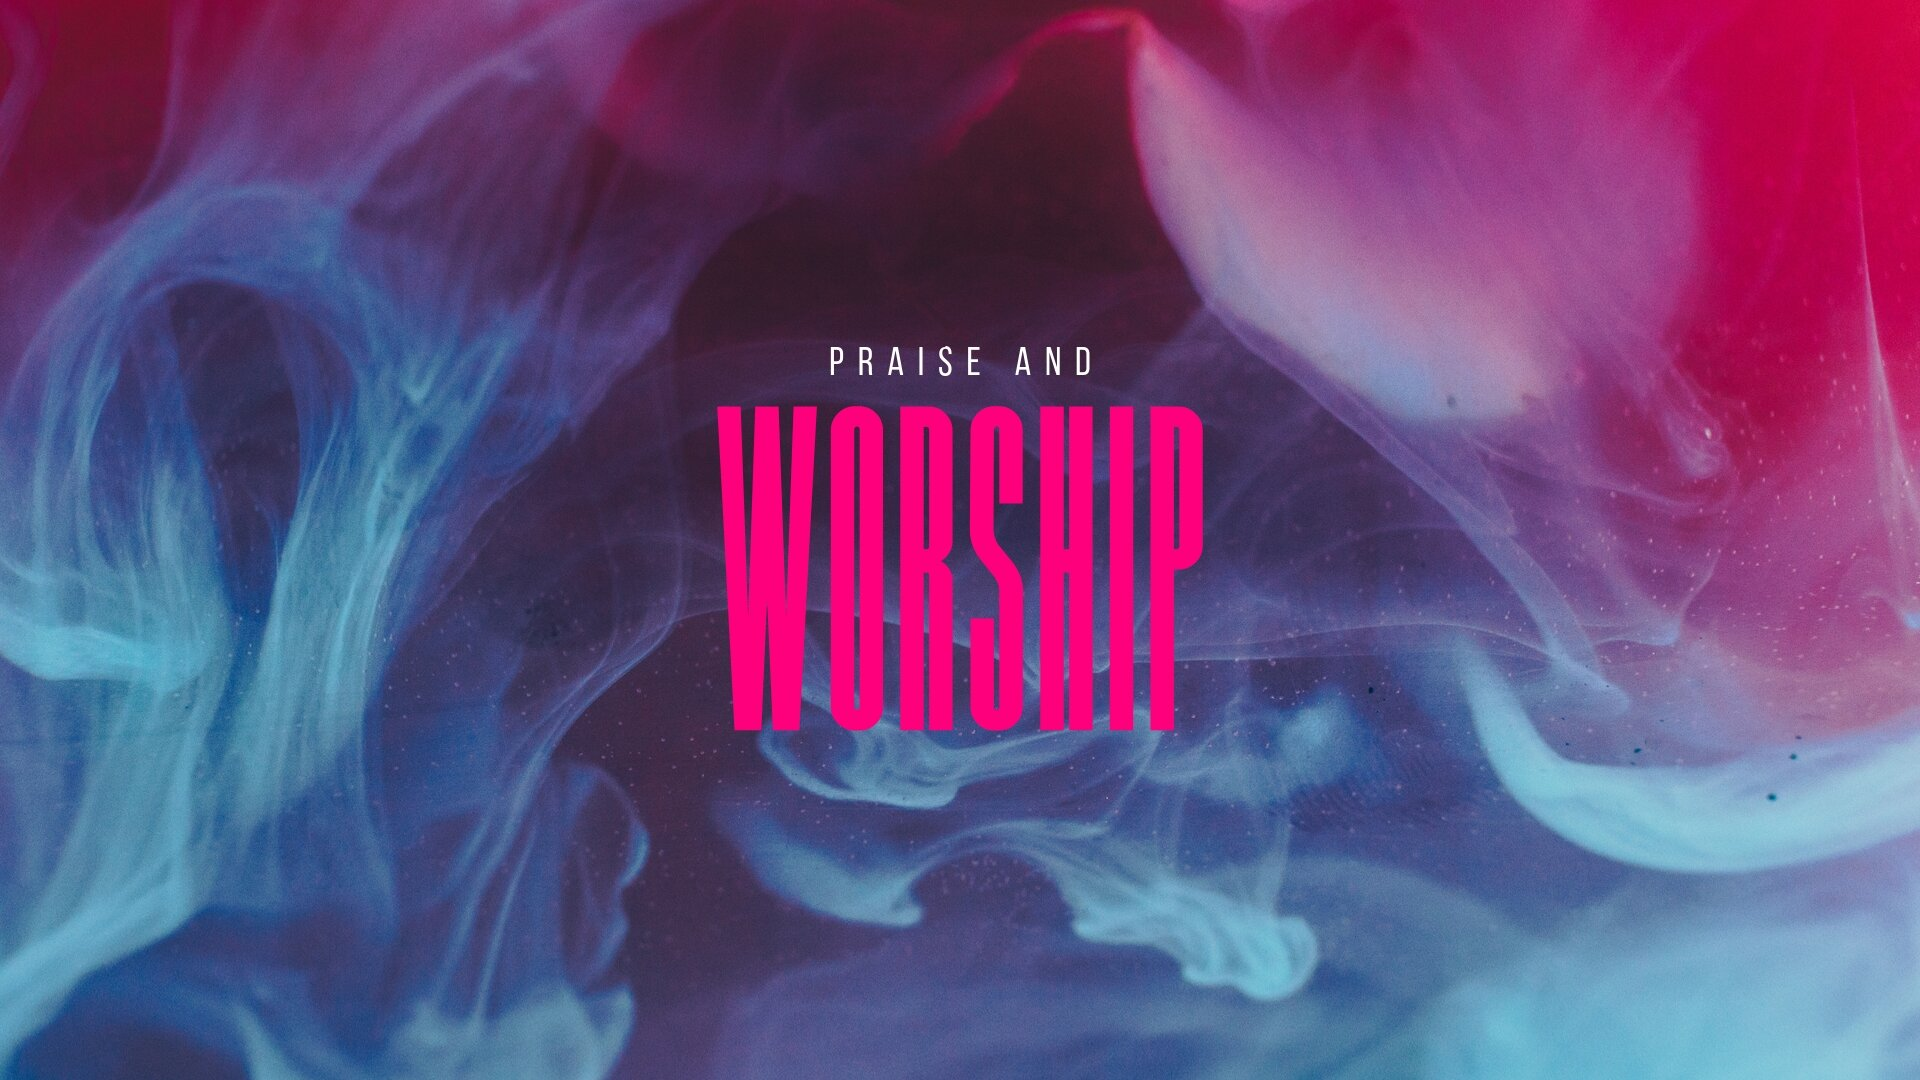 71459_Praise_and_worship.jpg